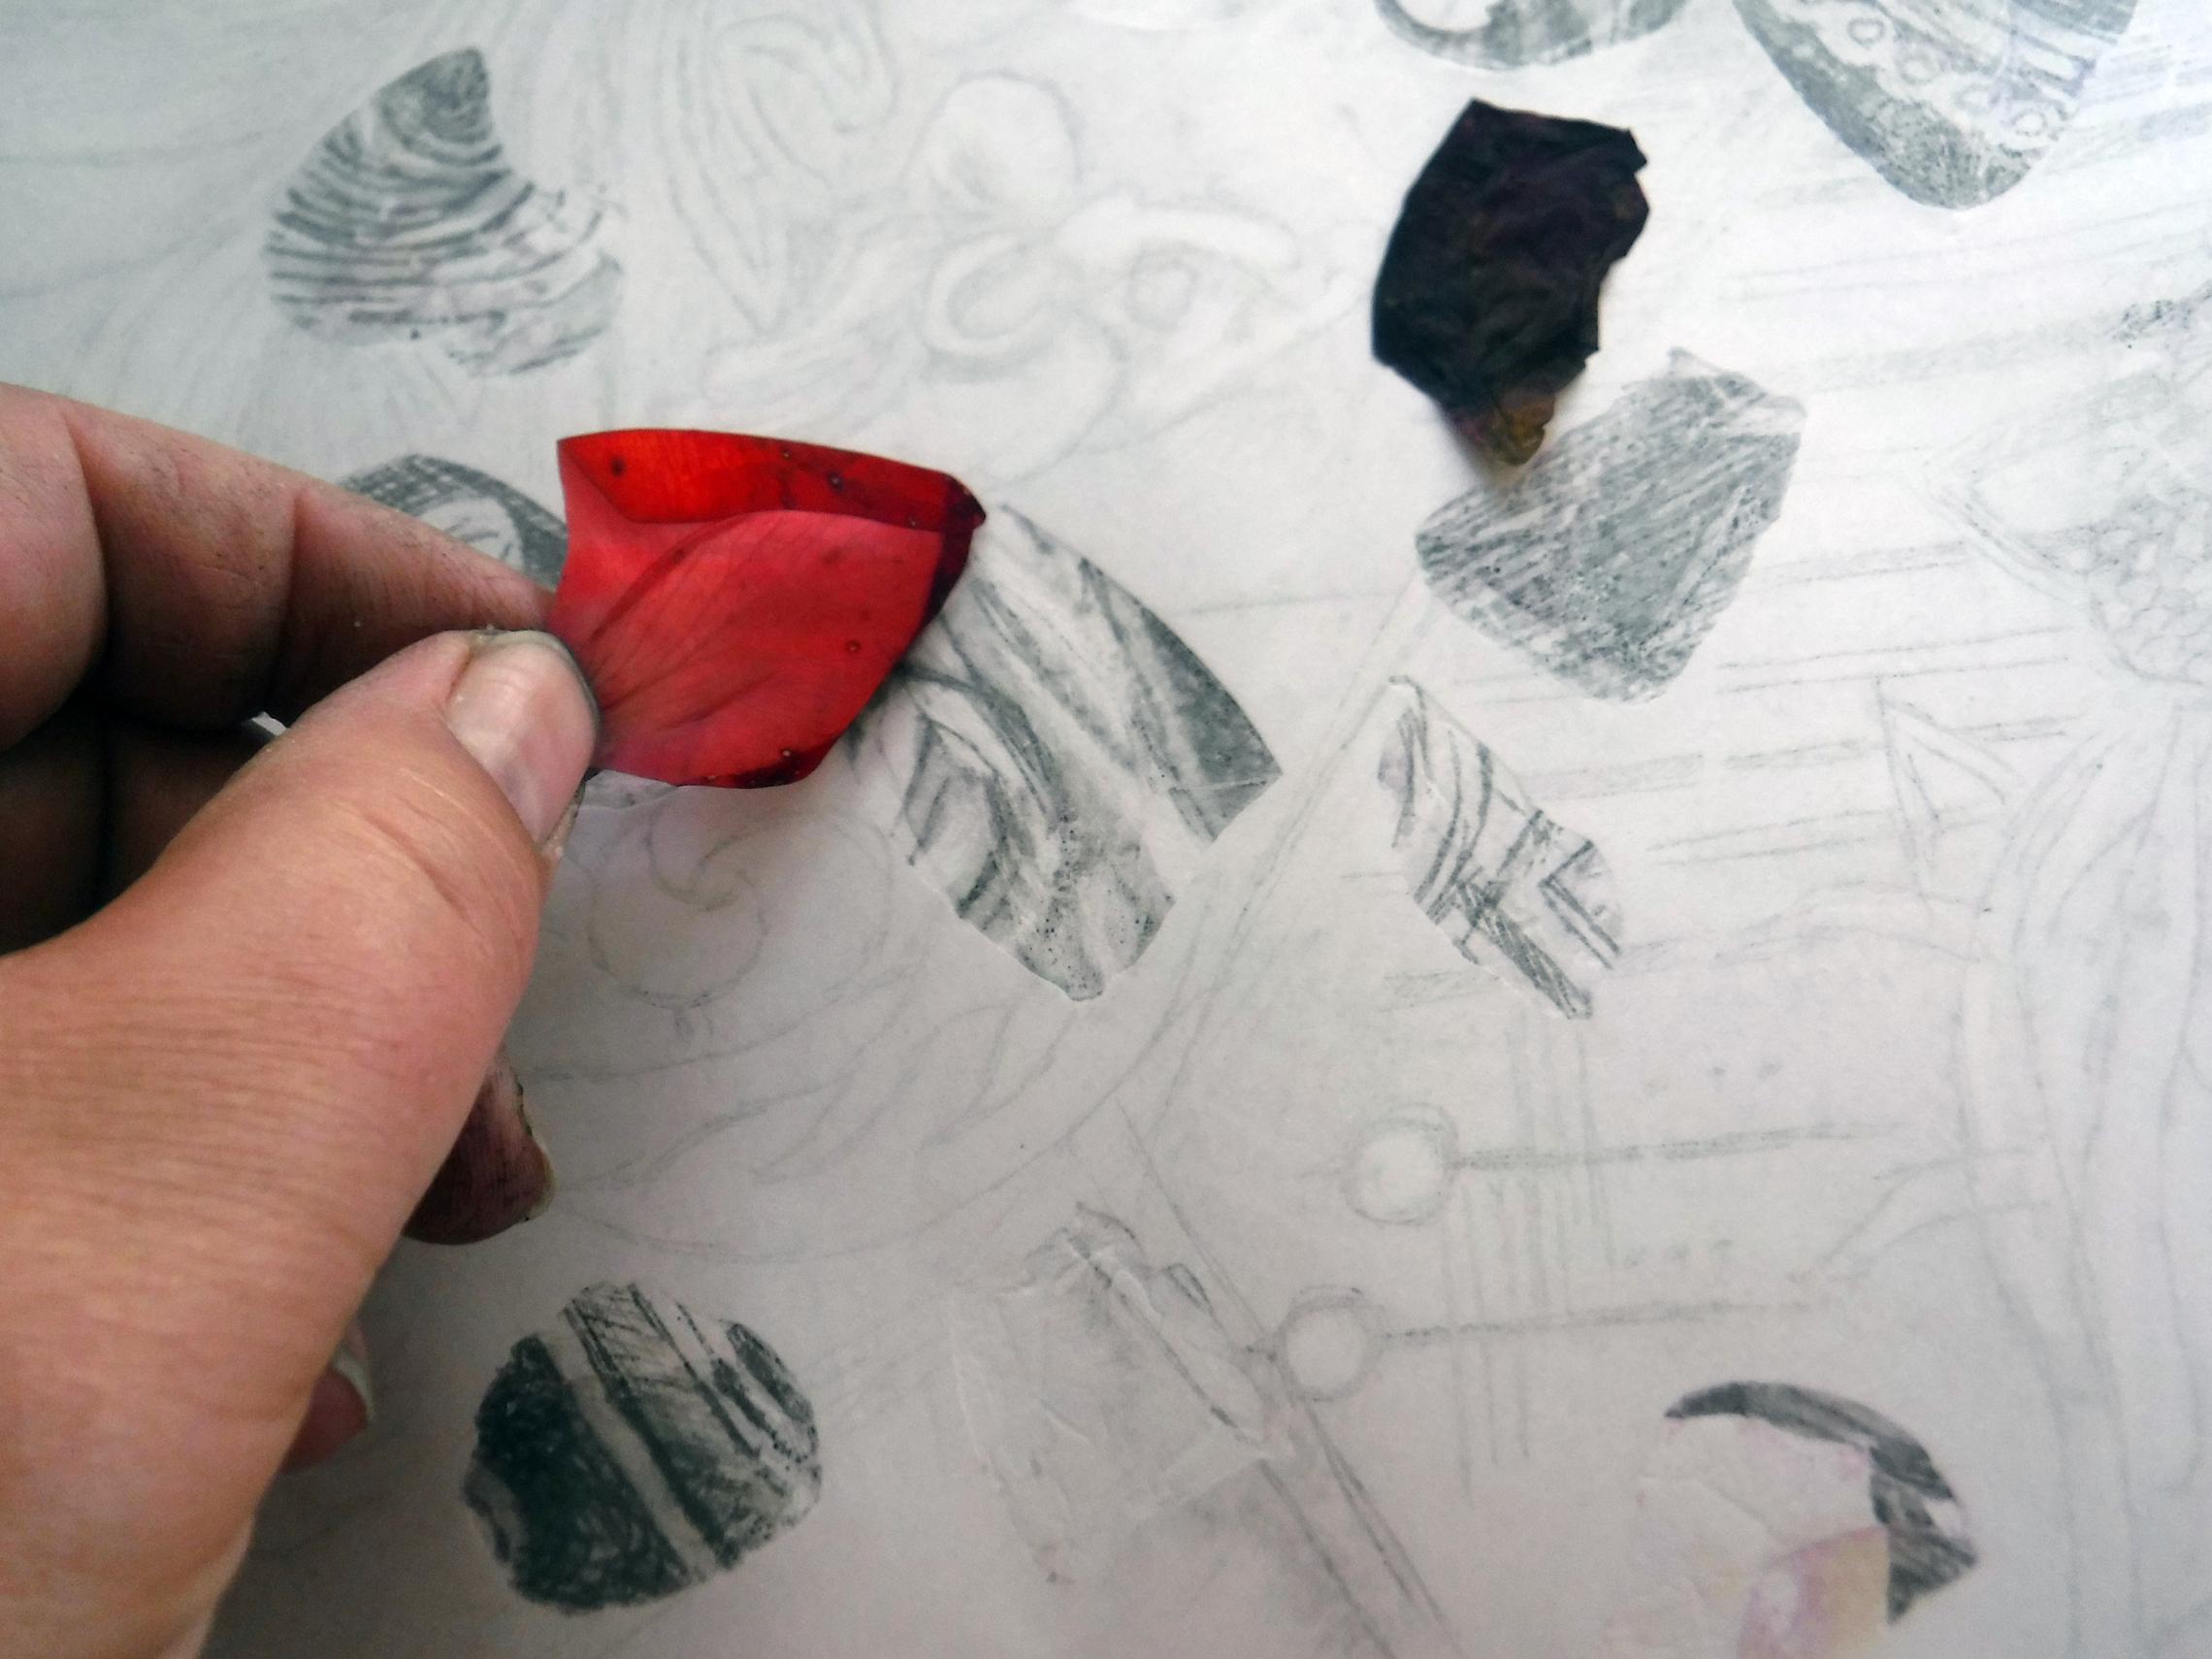 the-rose-petal-trasnfer-engraving-technique-low.jpg